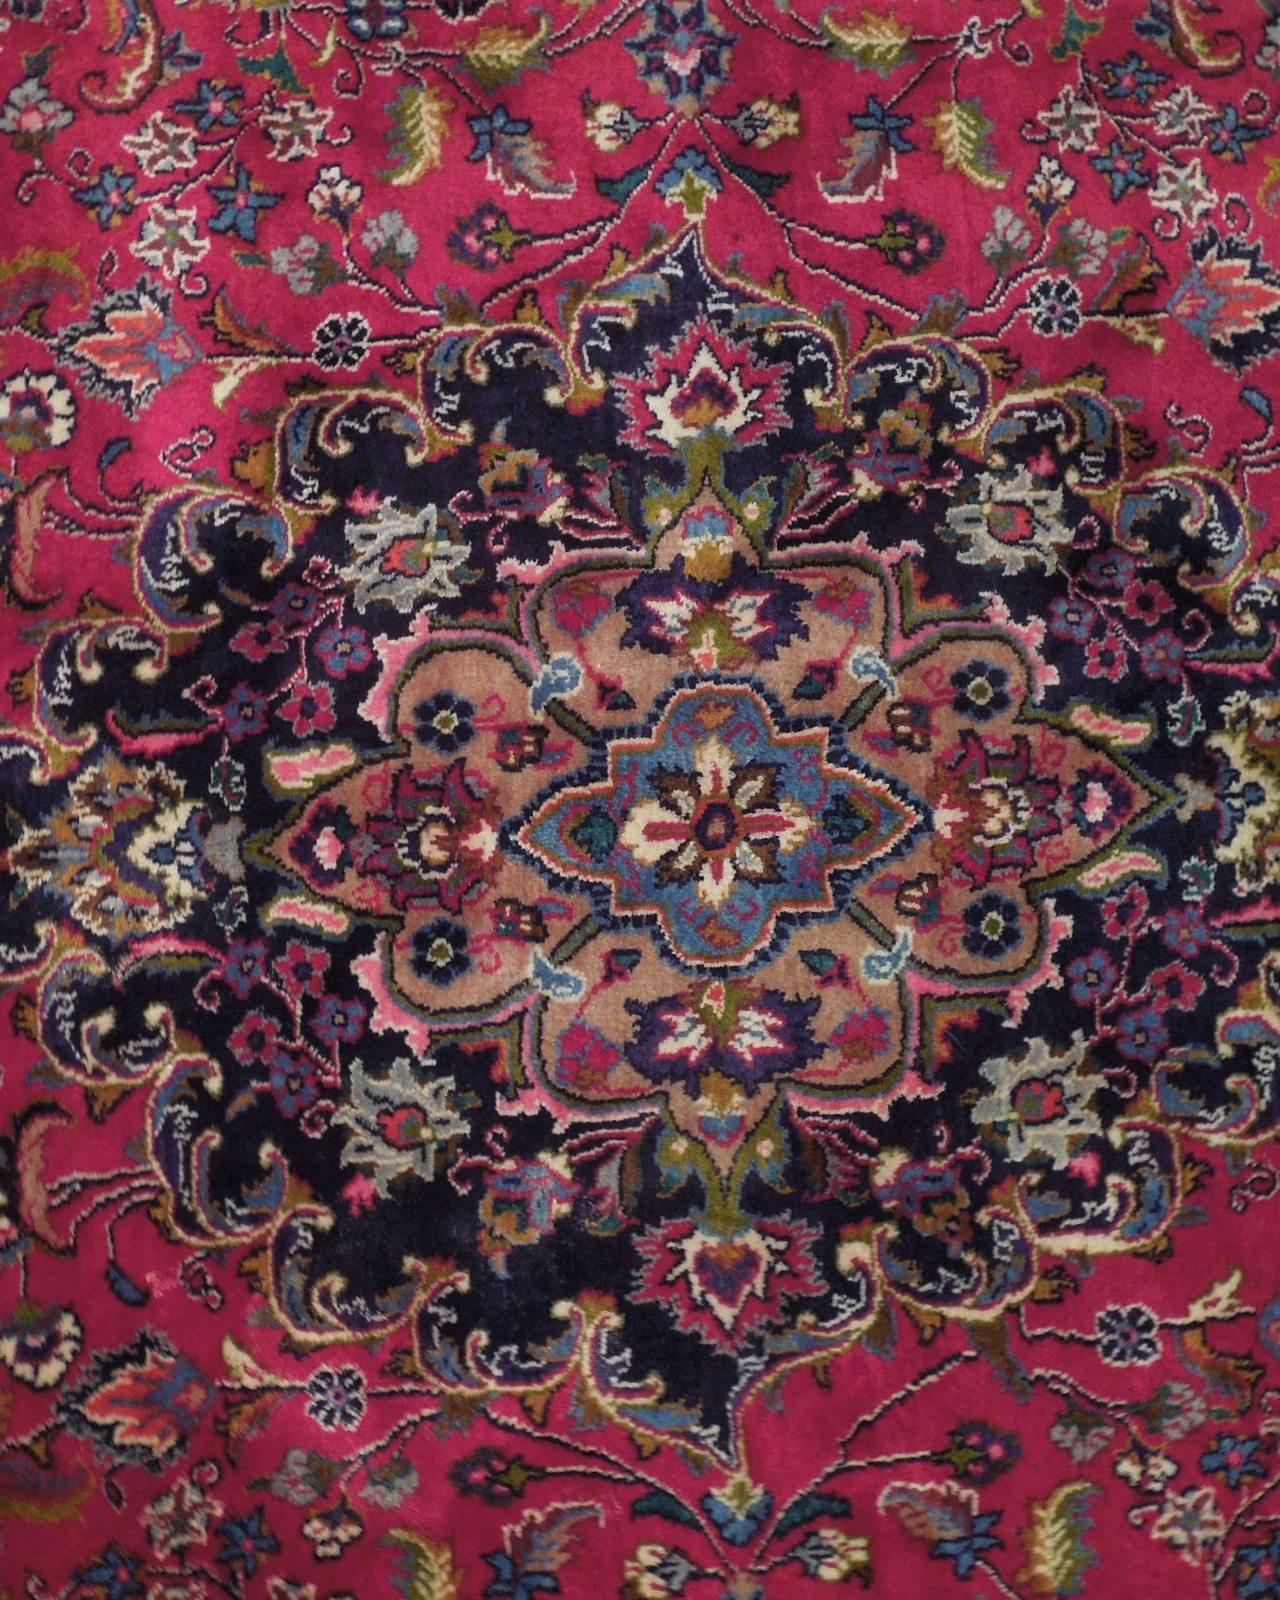 Red Wool Rug 10' x 12' Scarlet Vivid Original Traditional Persian Handmade Rug image 11